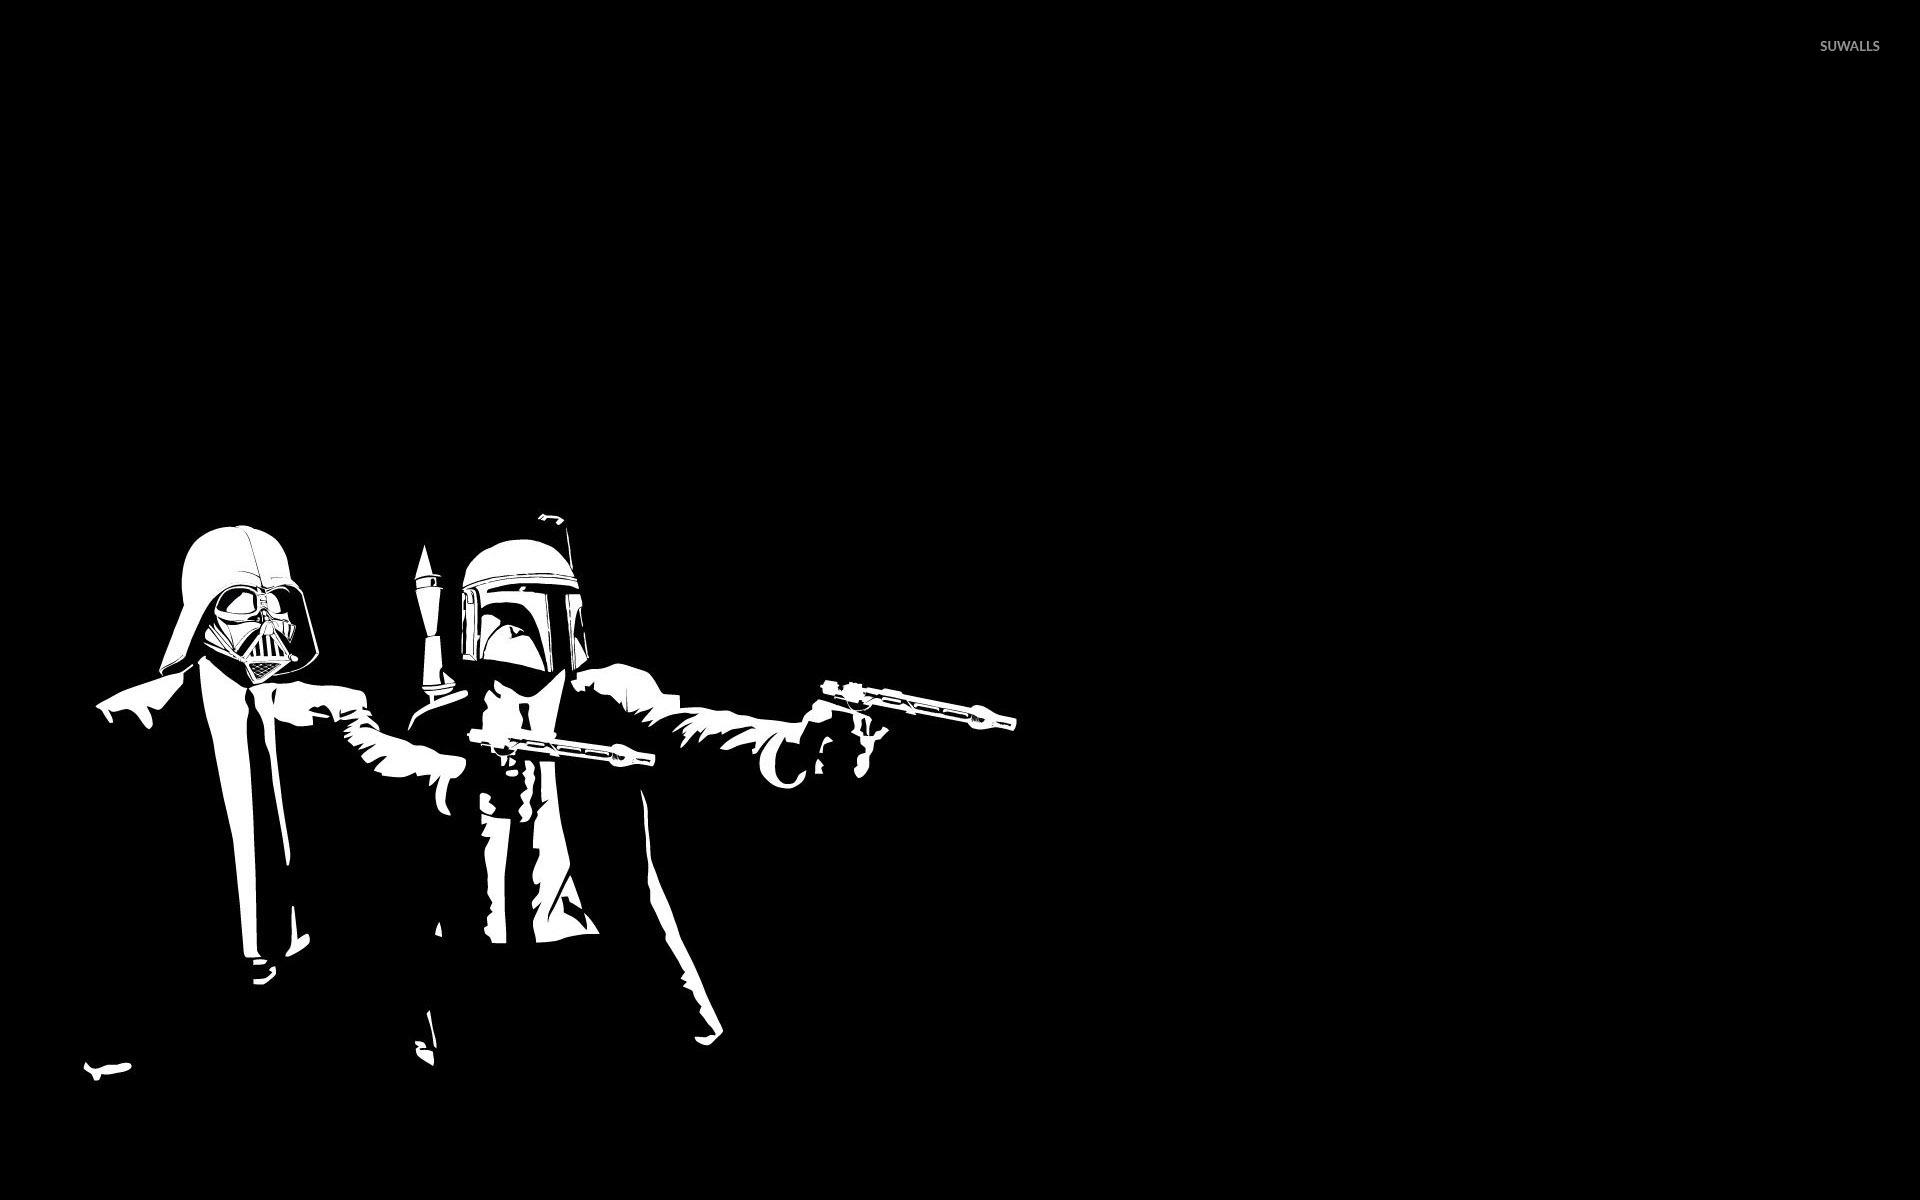 Pulp Fiction Star Wars Crossover Wallpaper Vector Wallpapers 26431